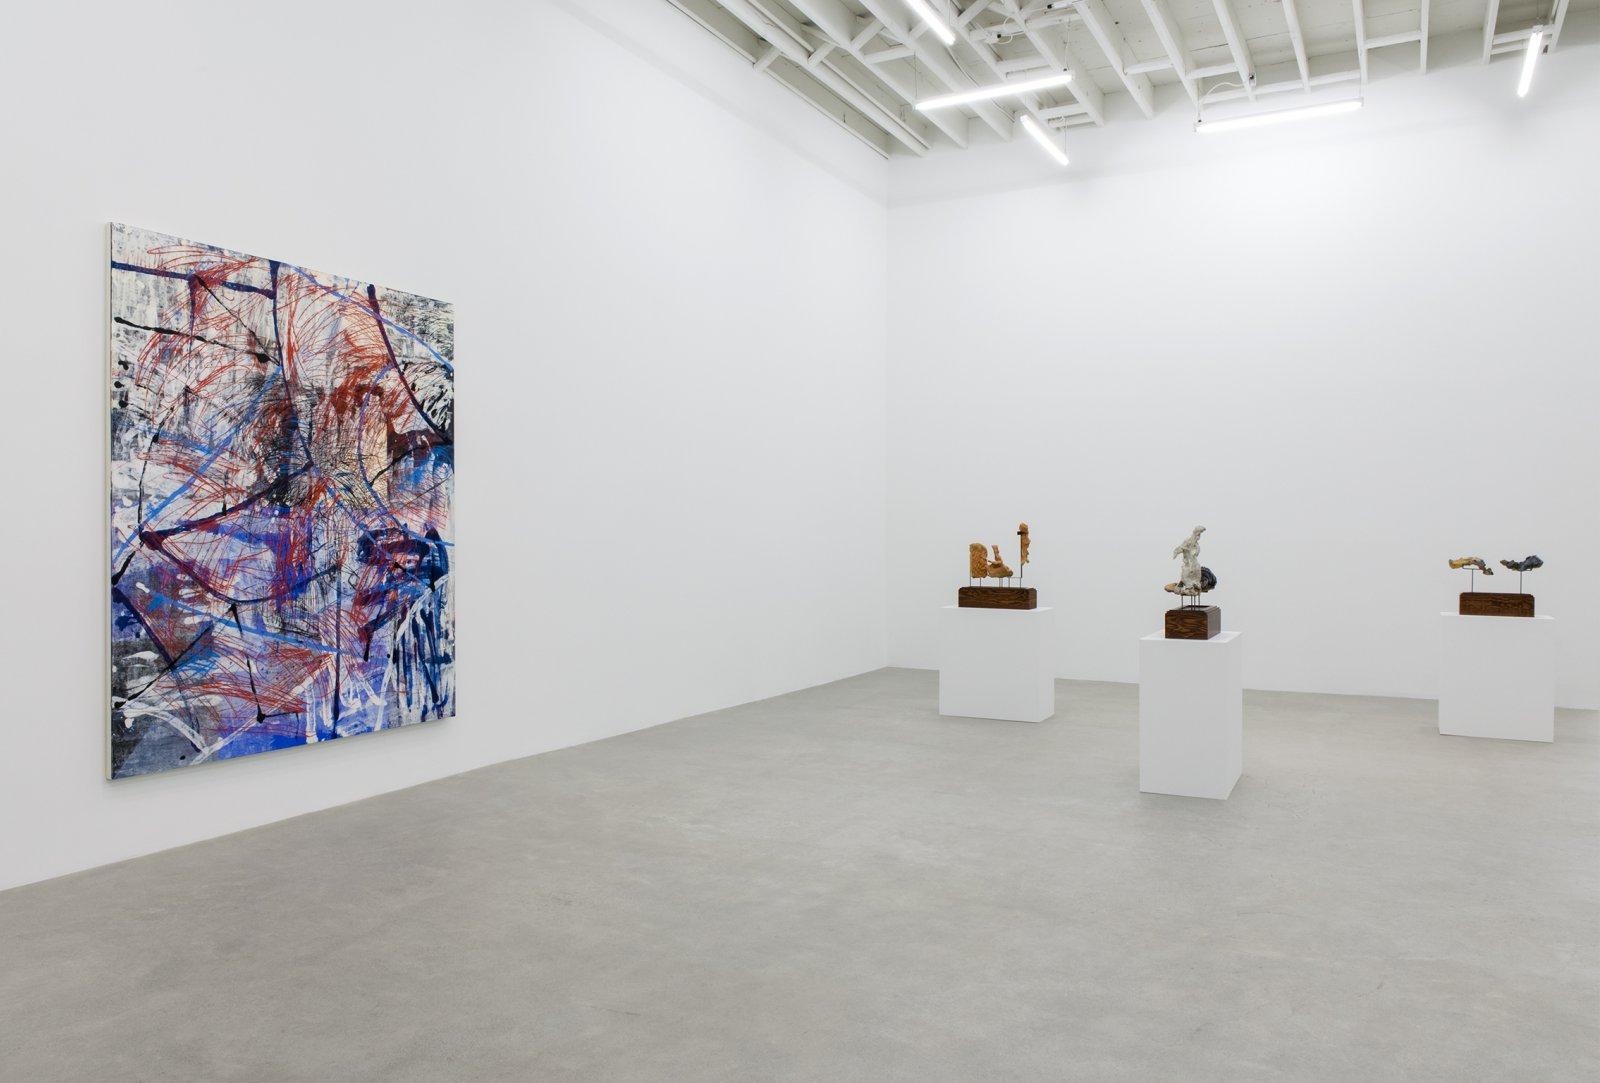 Damian Moppett, installation view, Catriona Jeffries, 2016  by Damian Moppett